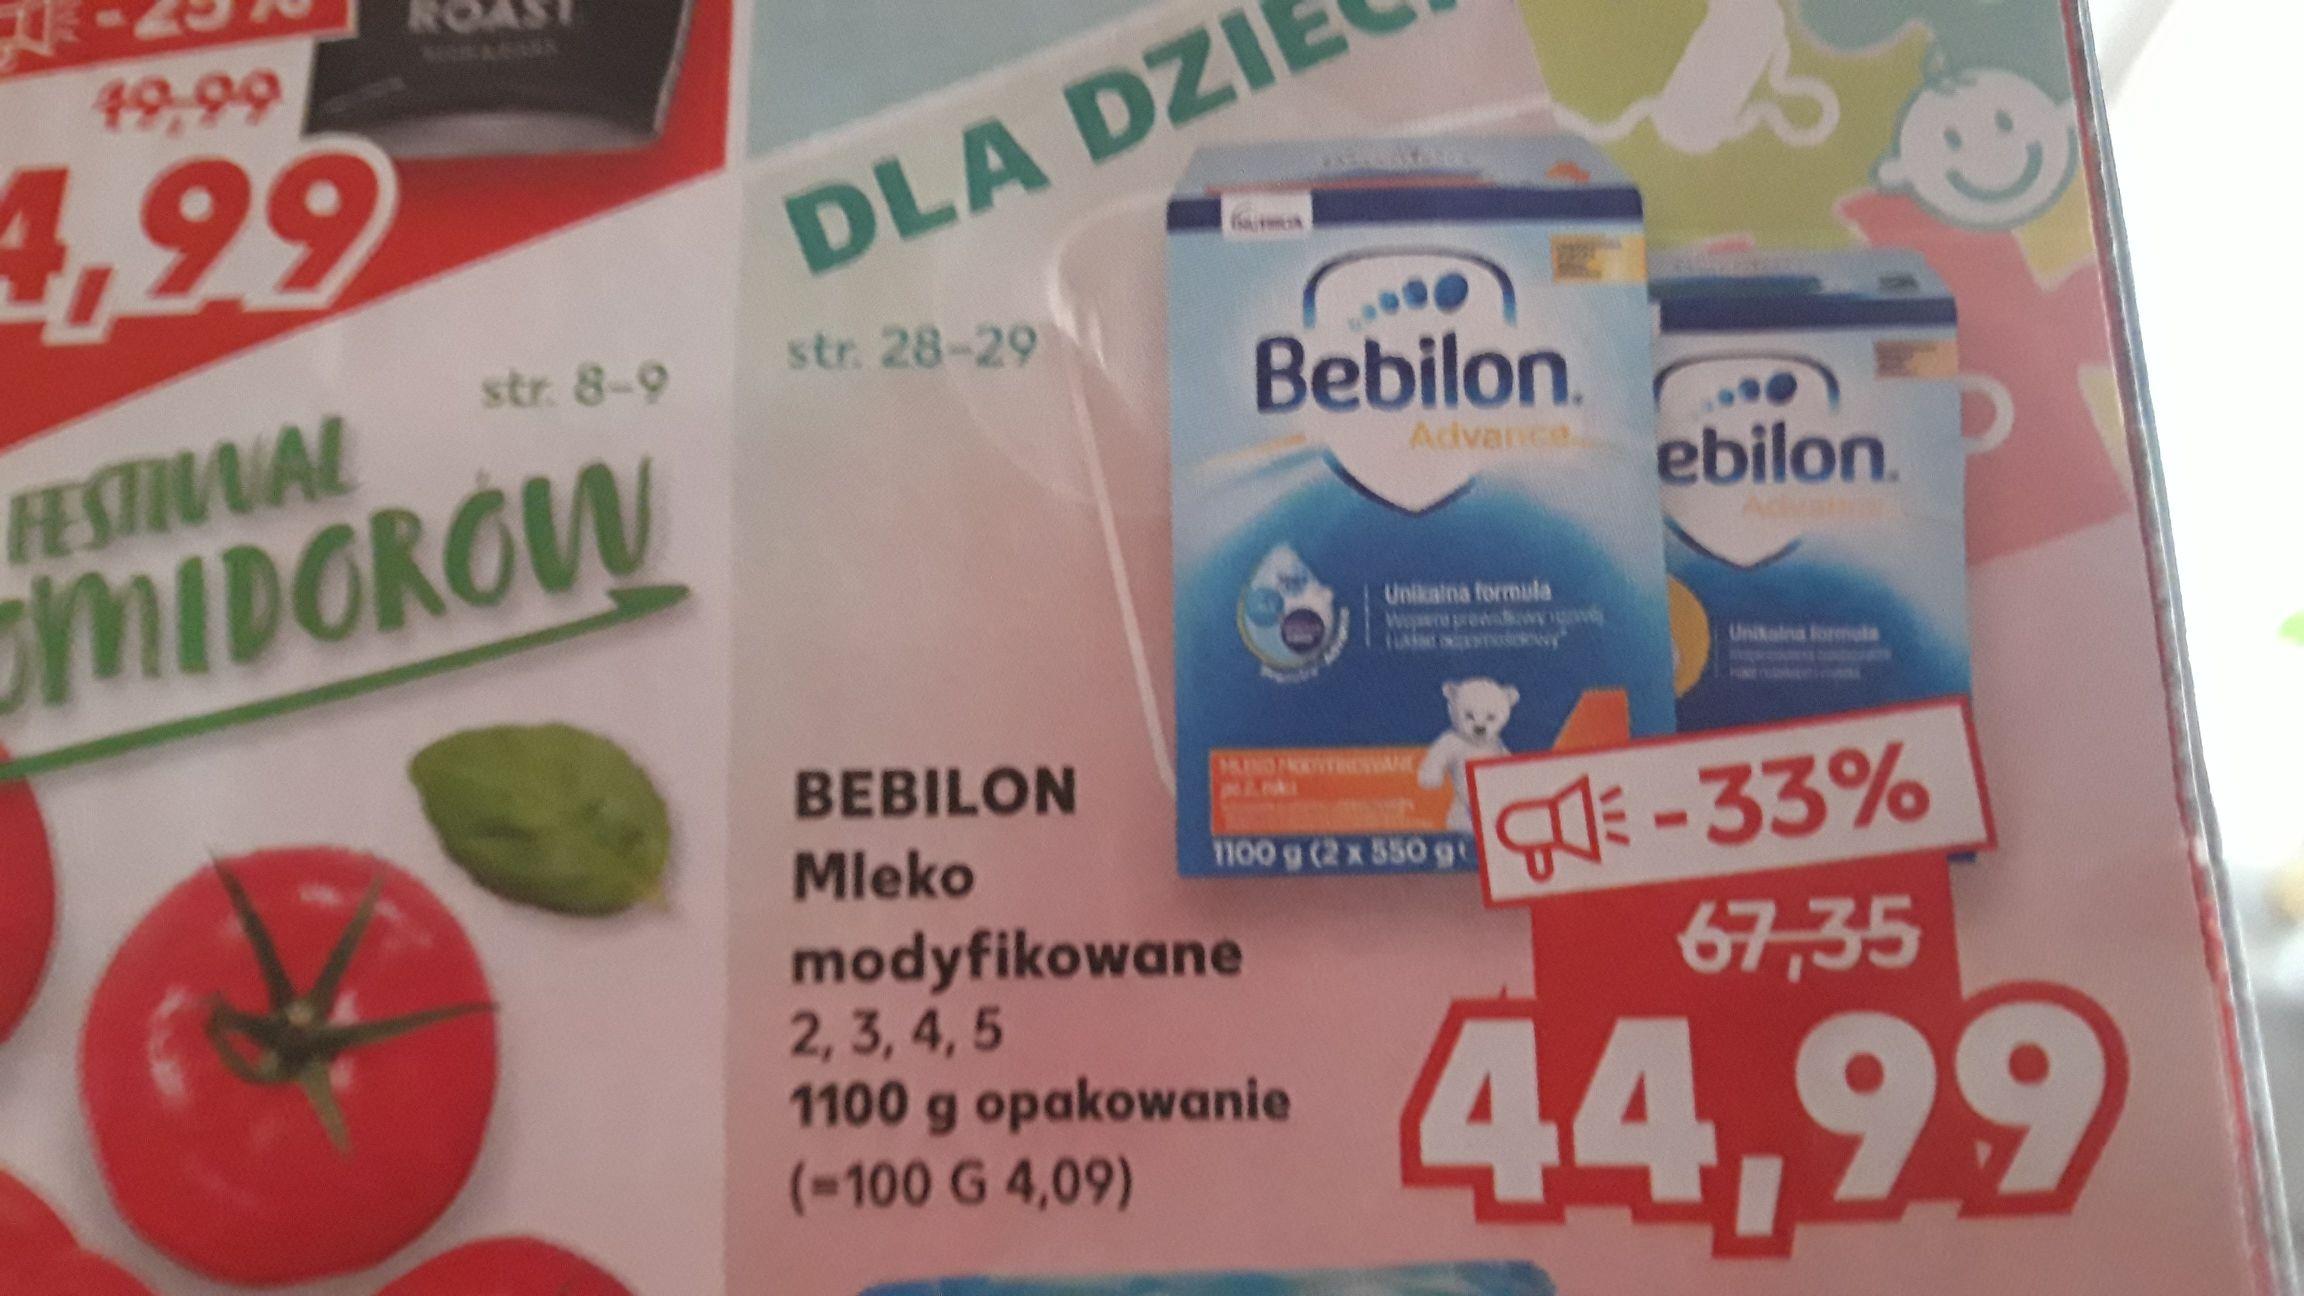 Kaufland BEBILON Advanced Mleko Modyfikowane 2,3,4,5 1100g